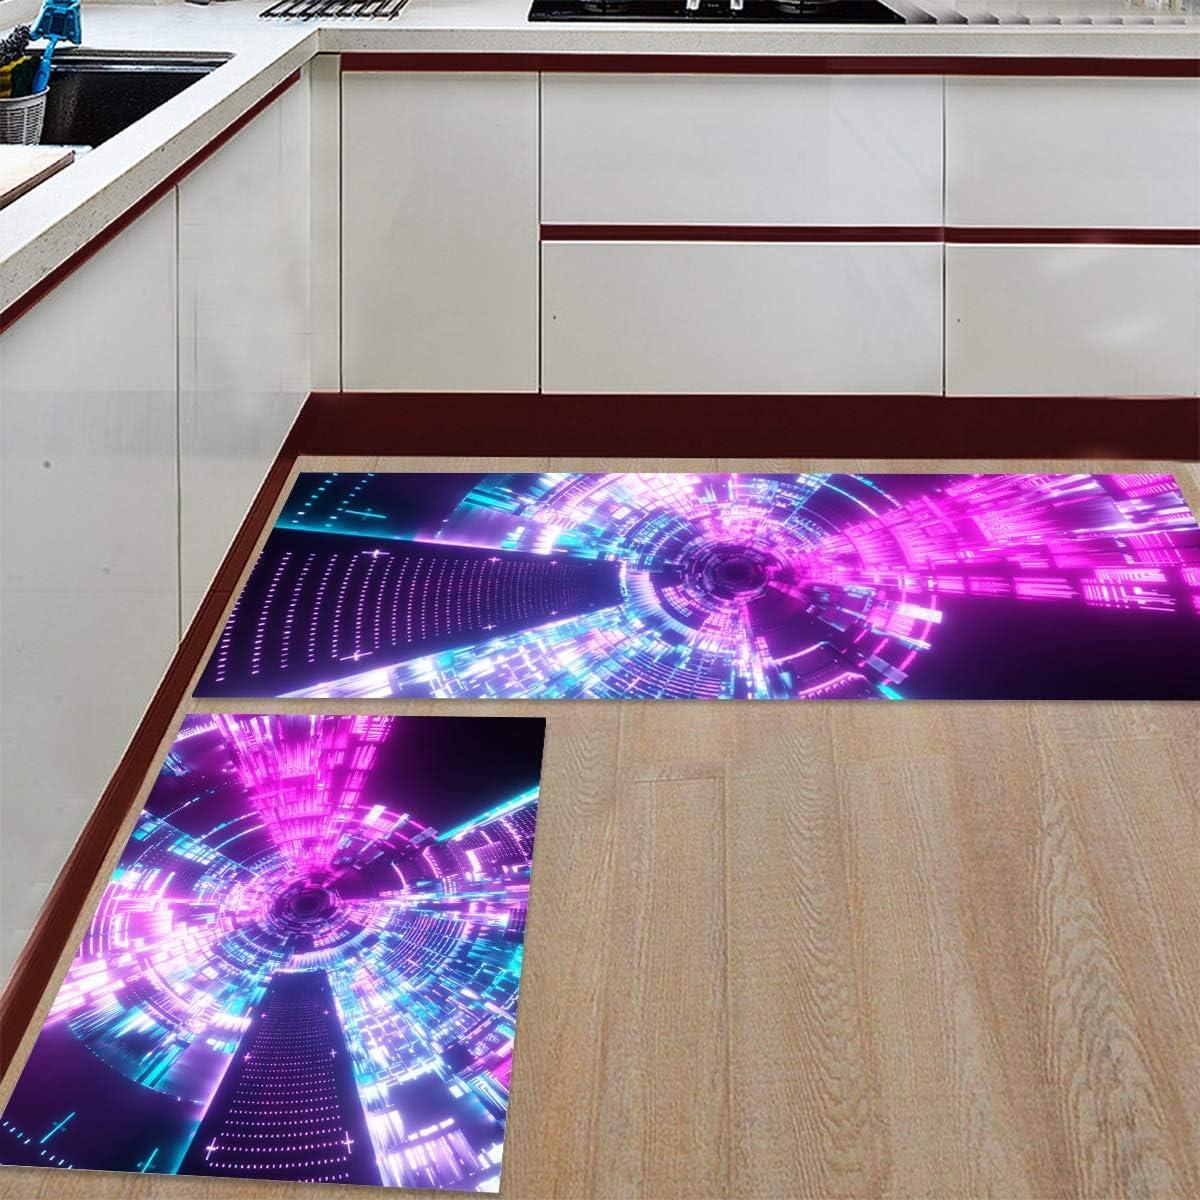 Advancey 2 Pieces Anti-Slip Kitchen Cyberpu Science half Fiction Mats Genuine Free Shipping